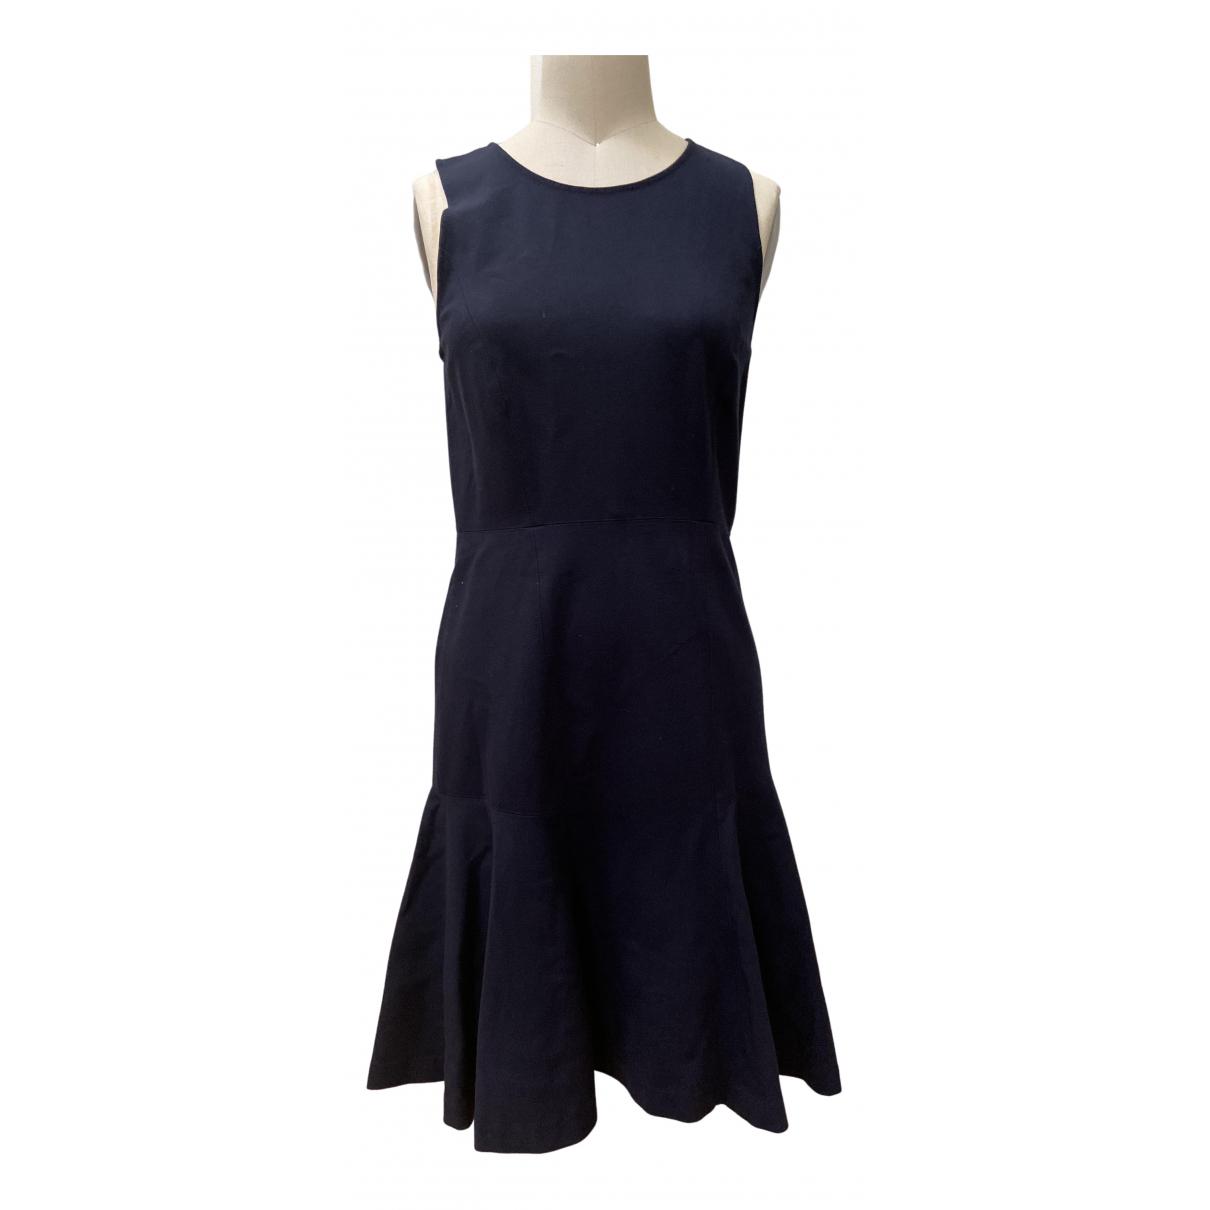 J.crew N Blue Cotton - elasthane dress for Women 8 US